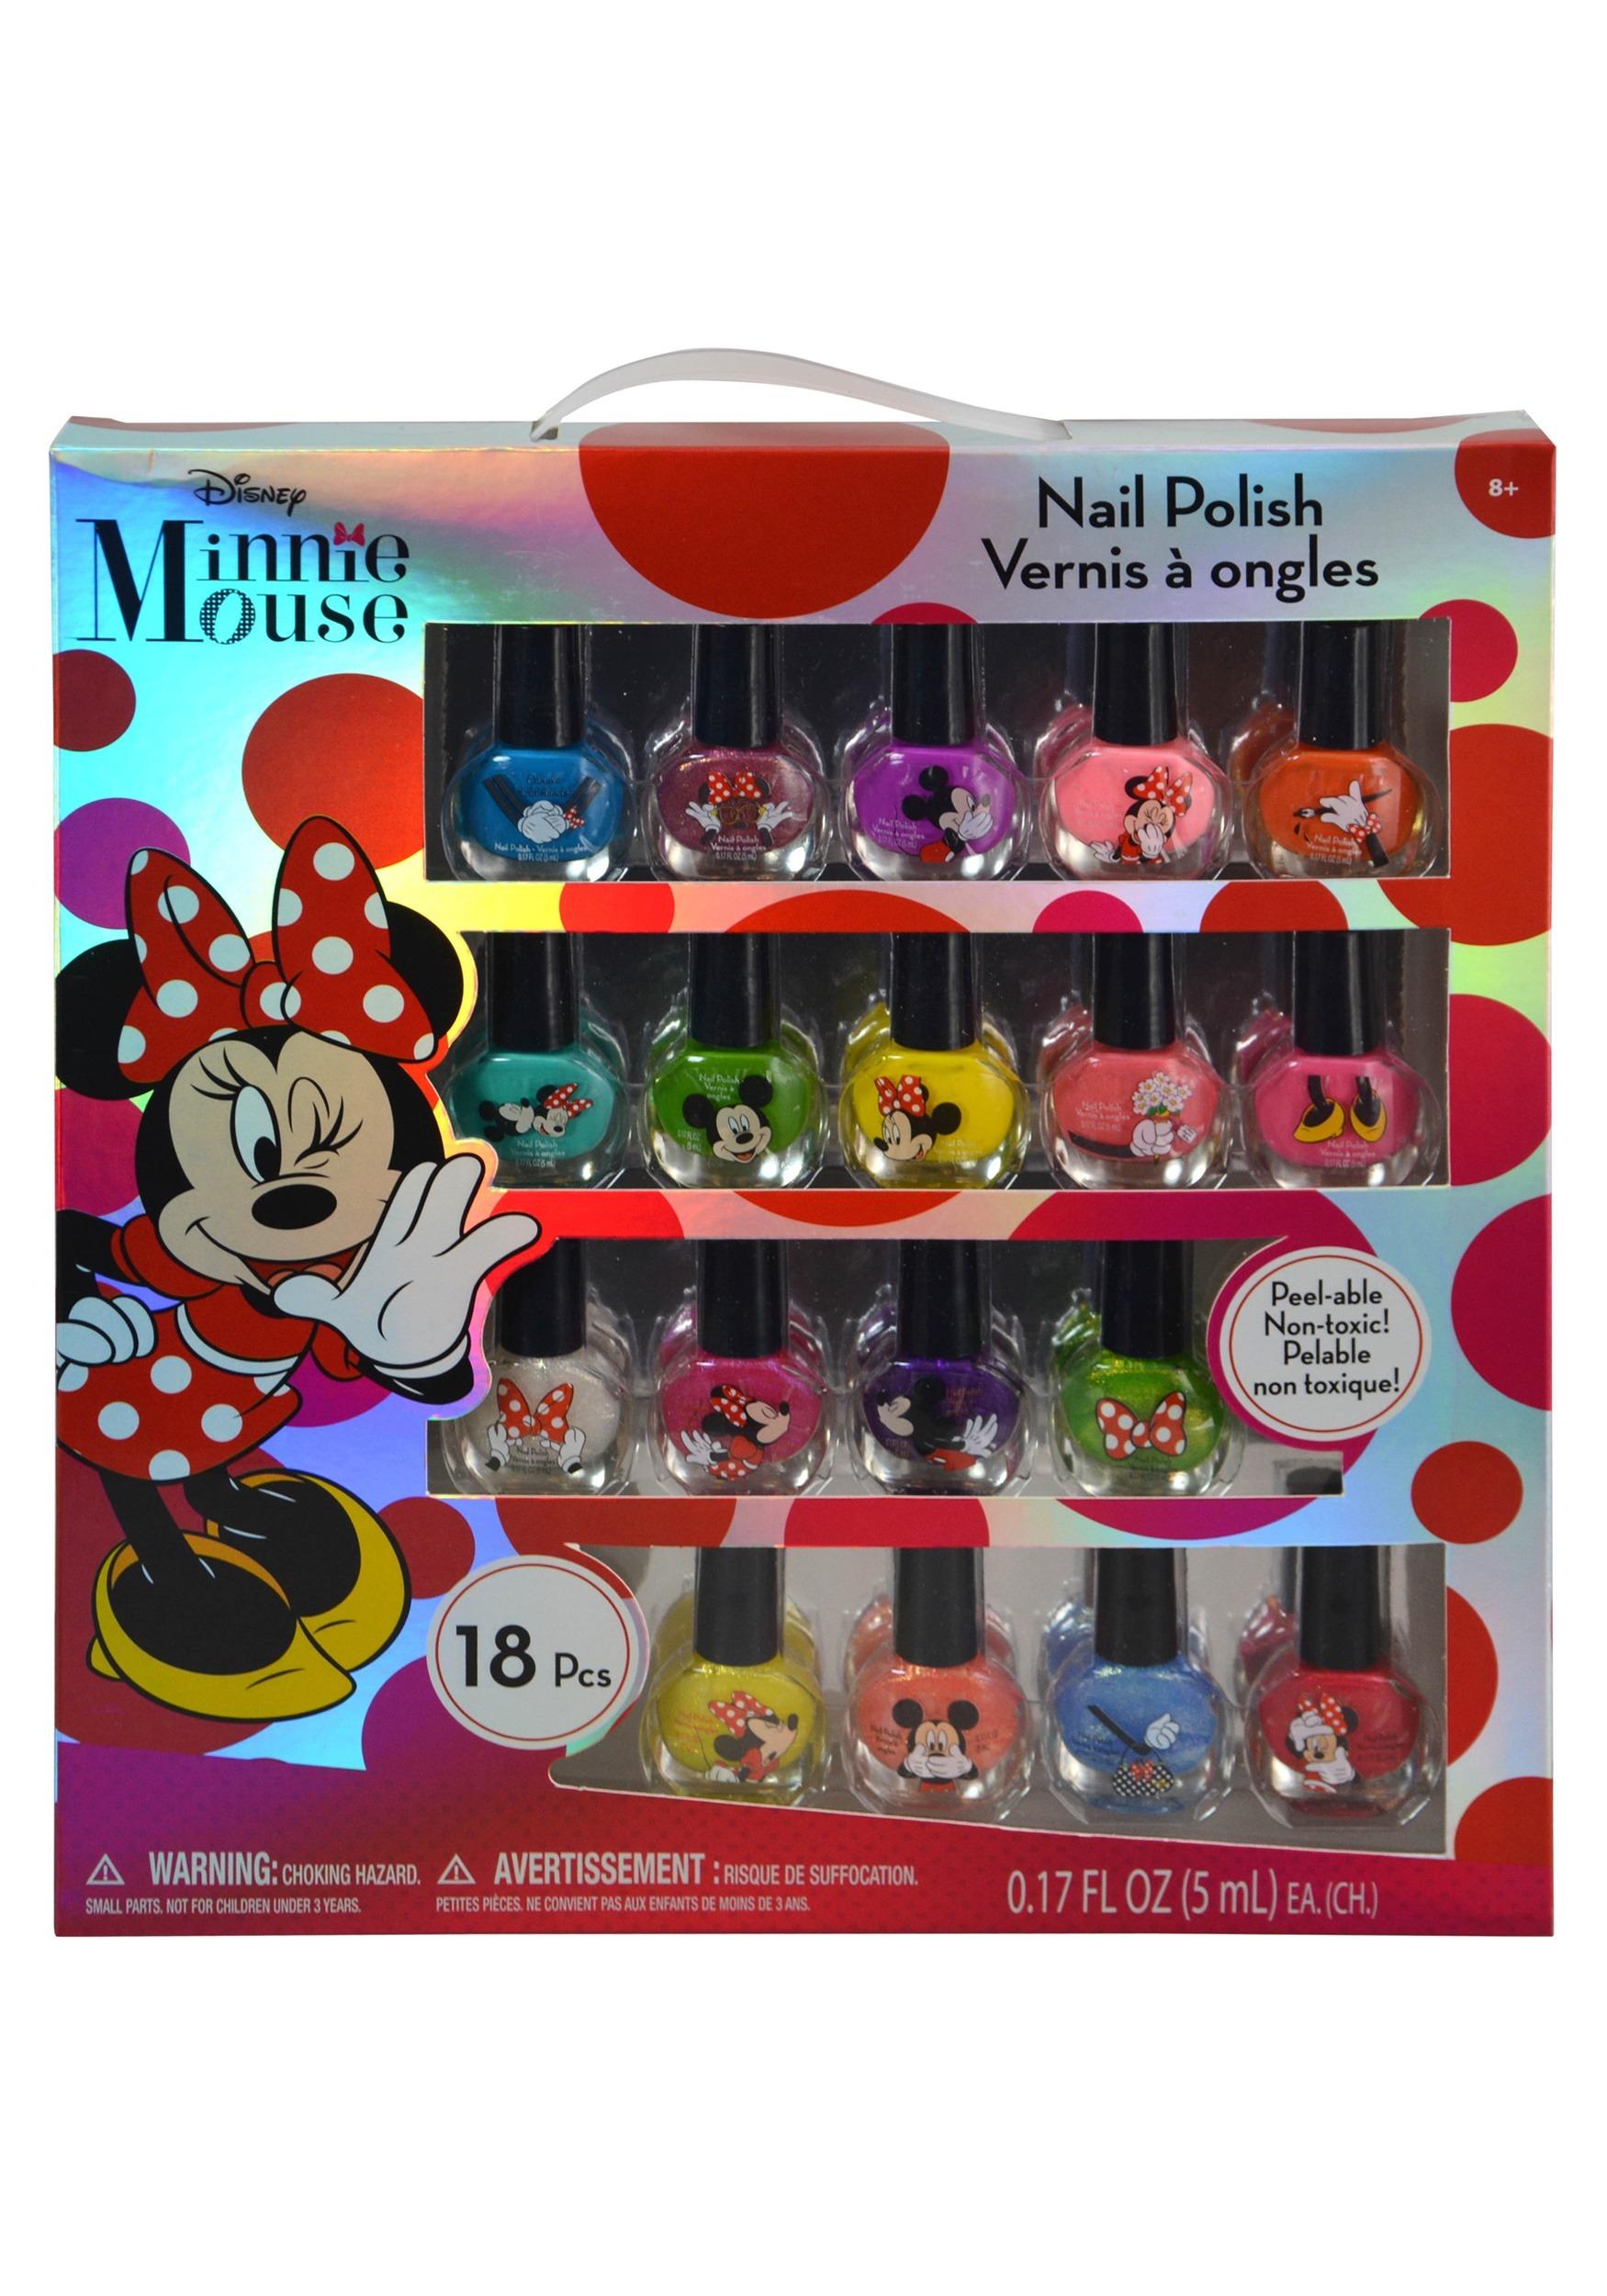 Disney Minnie Mouse 18 Piece Nail Polish Kit